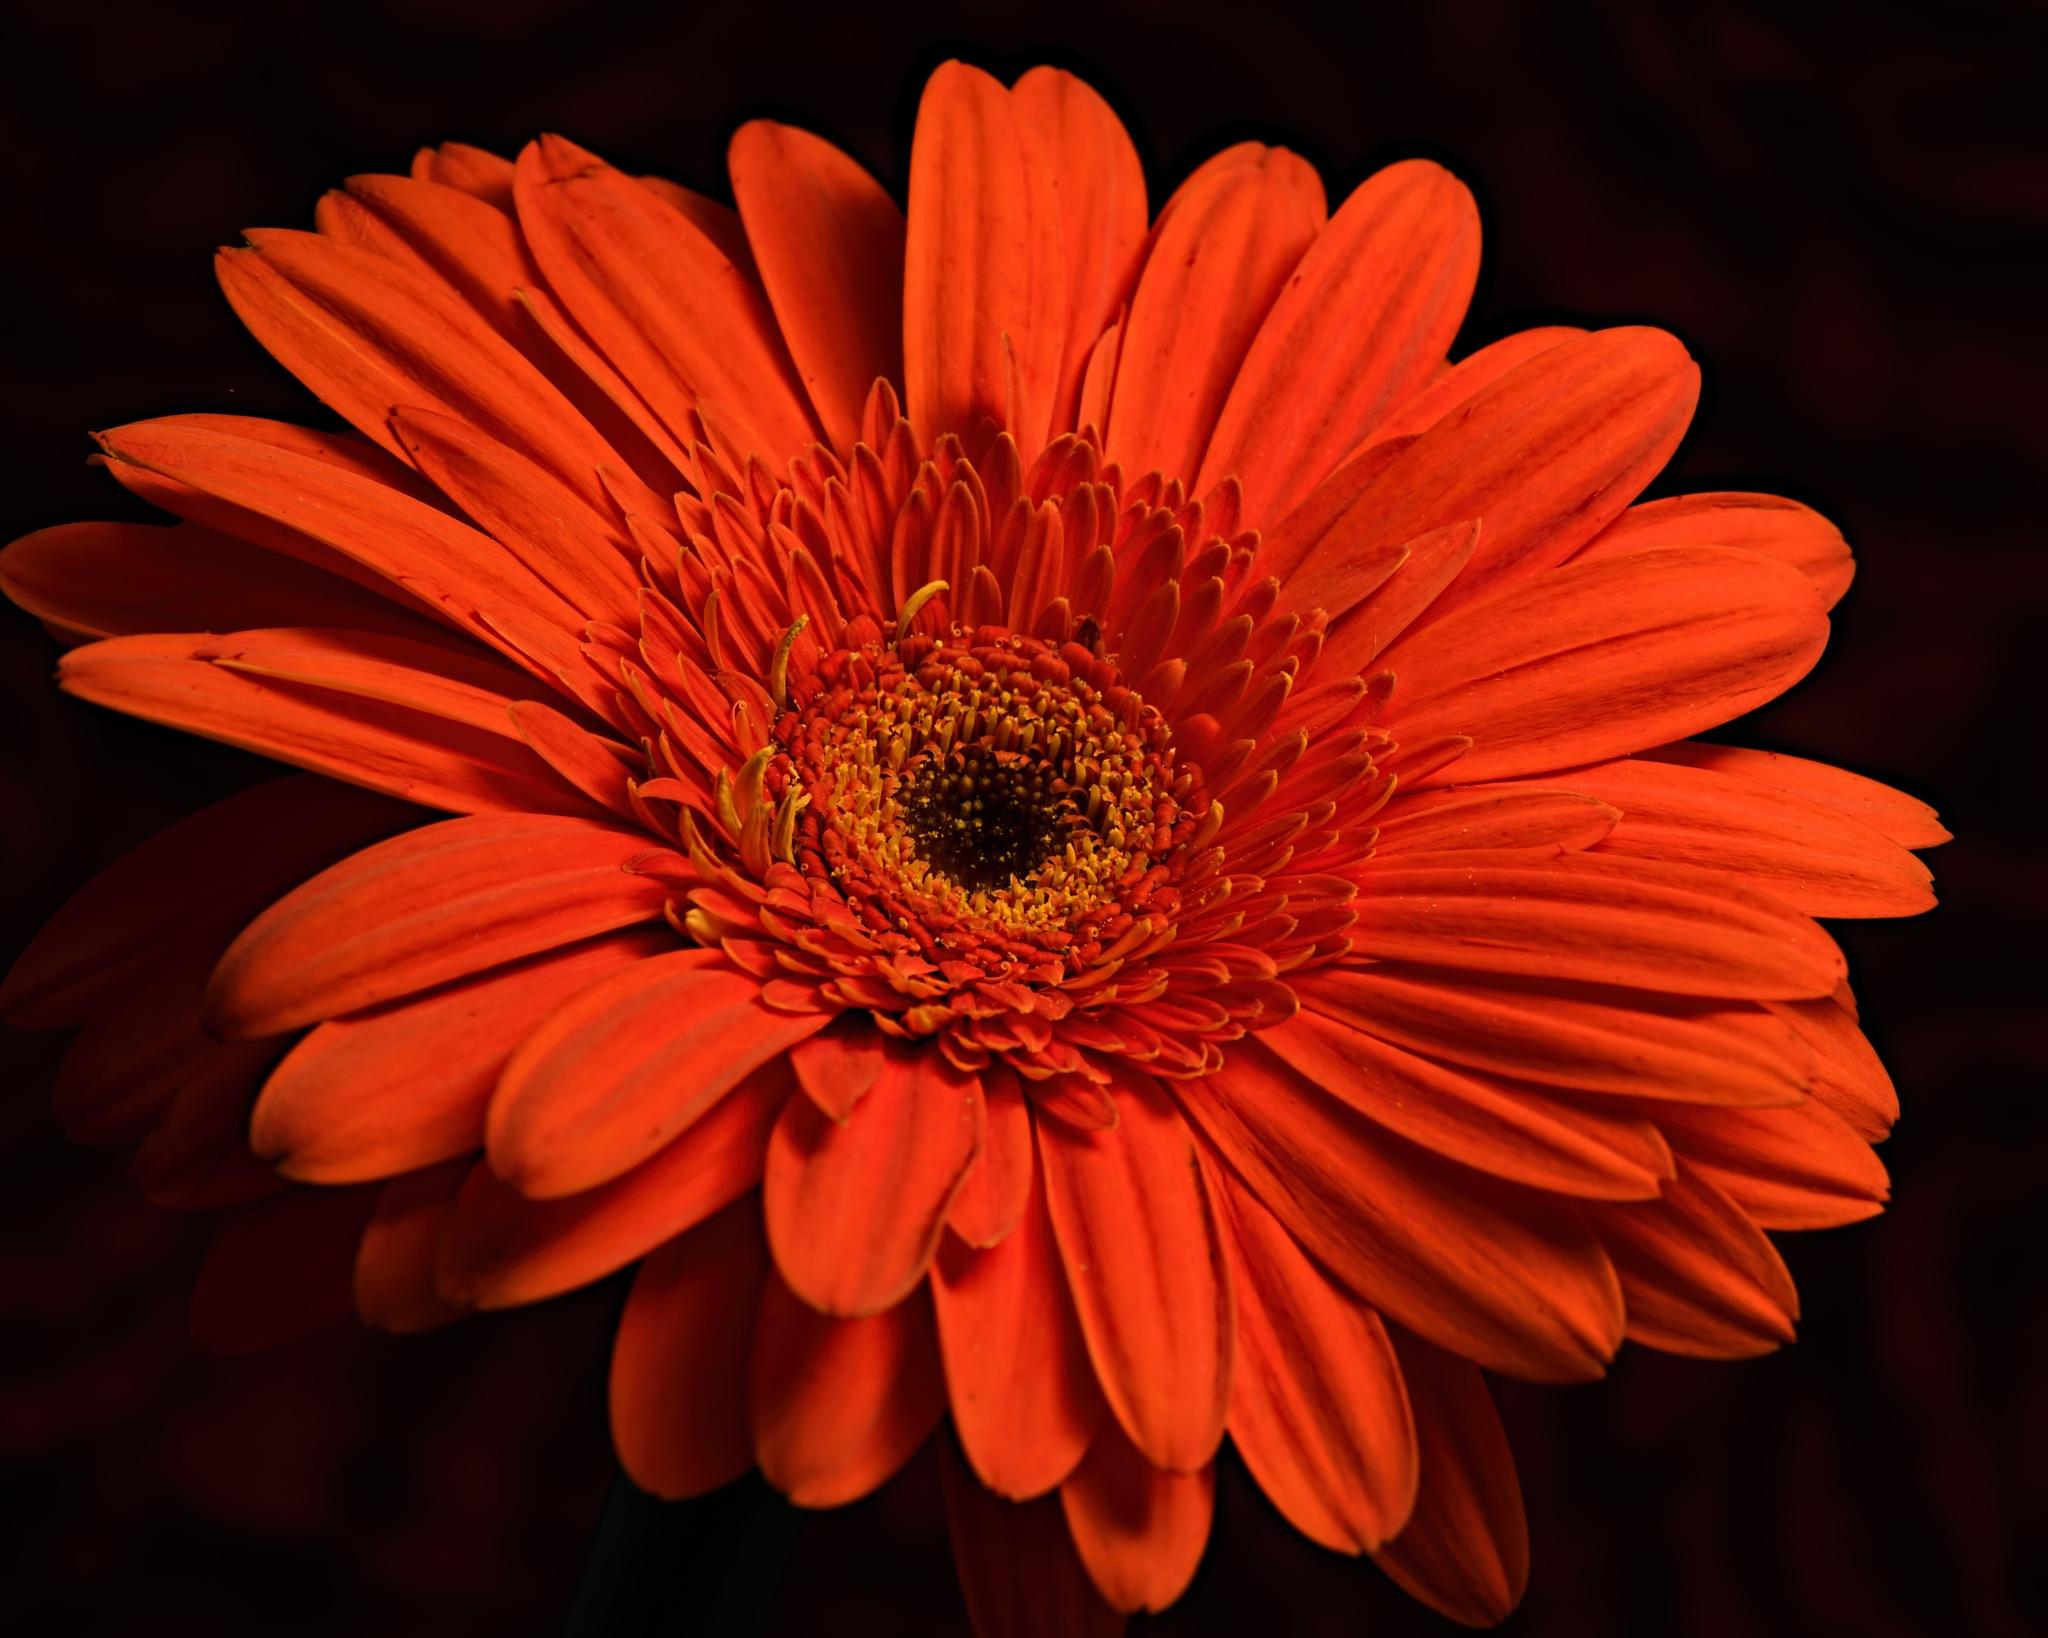 Orange Gerbera Daisy 1023 by ThomasJerger